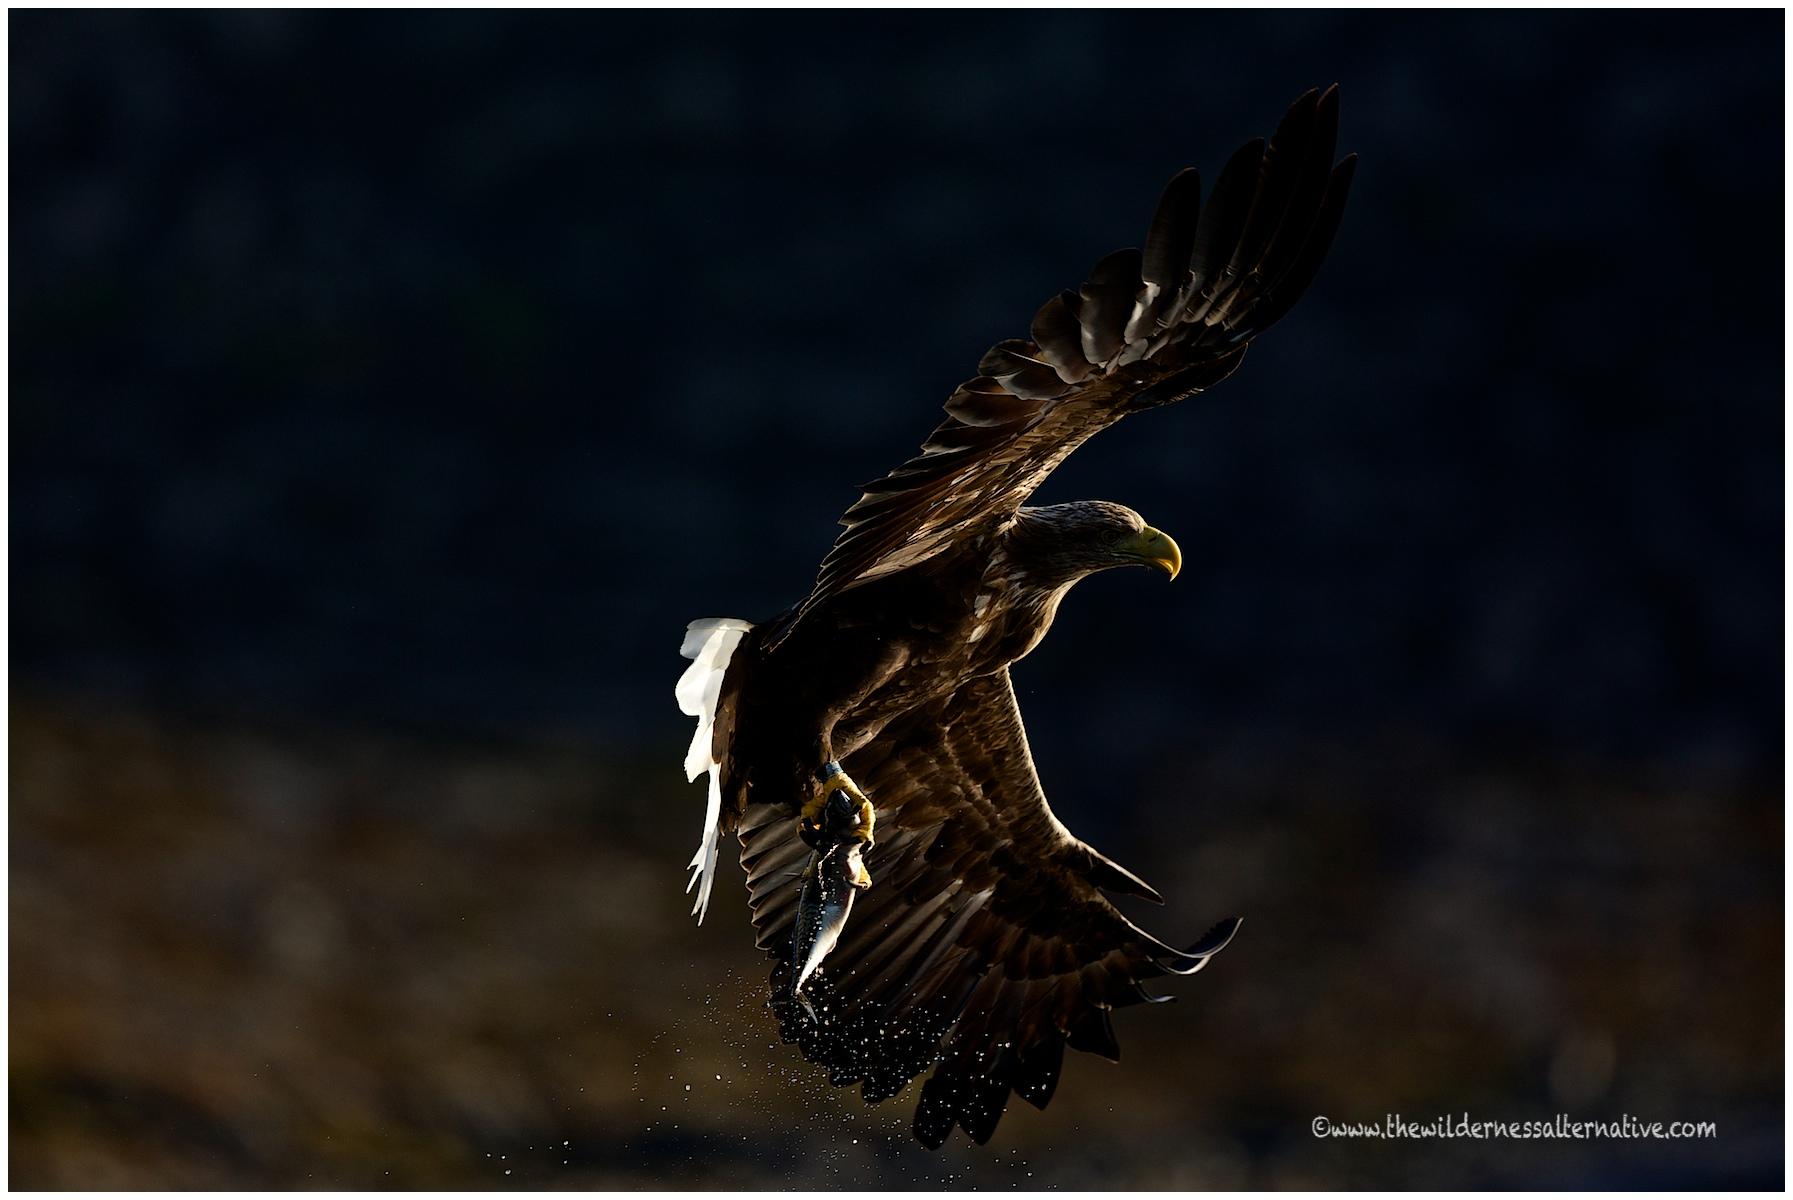 Norway 2012 Flatanger Eagles The Wilderness Alternative